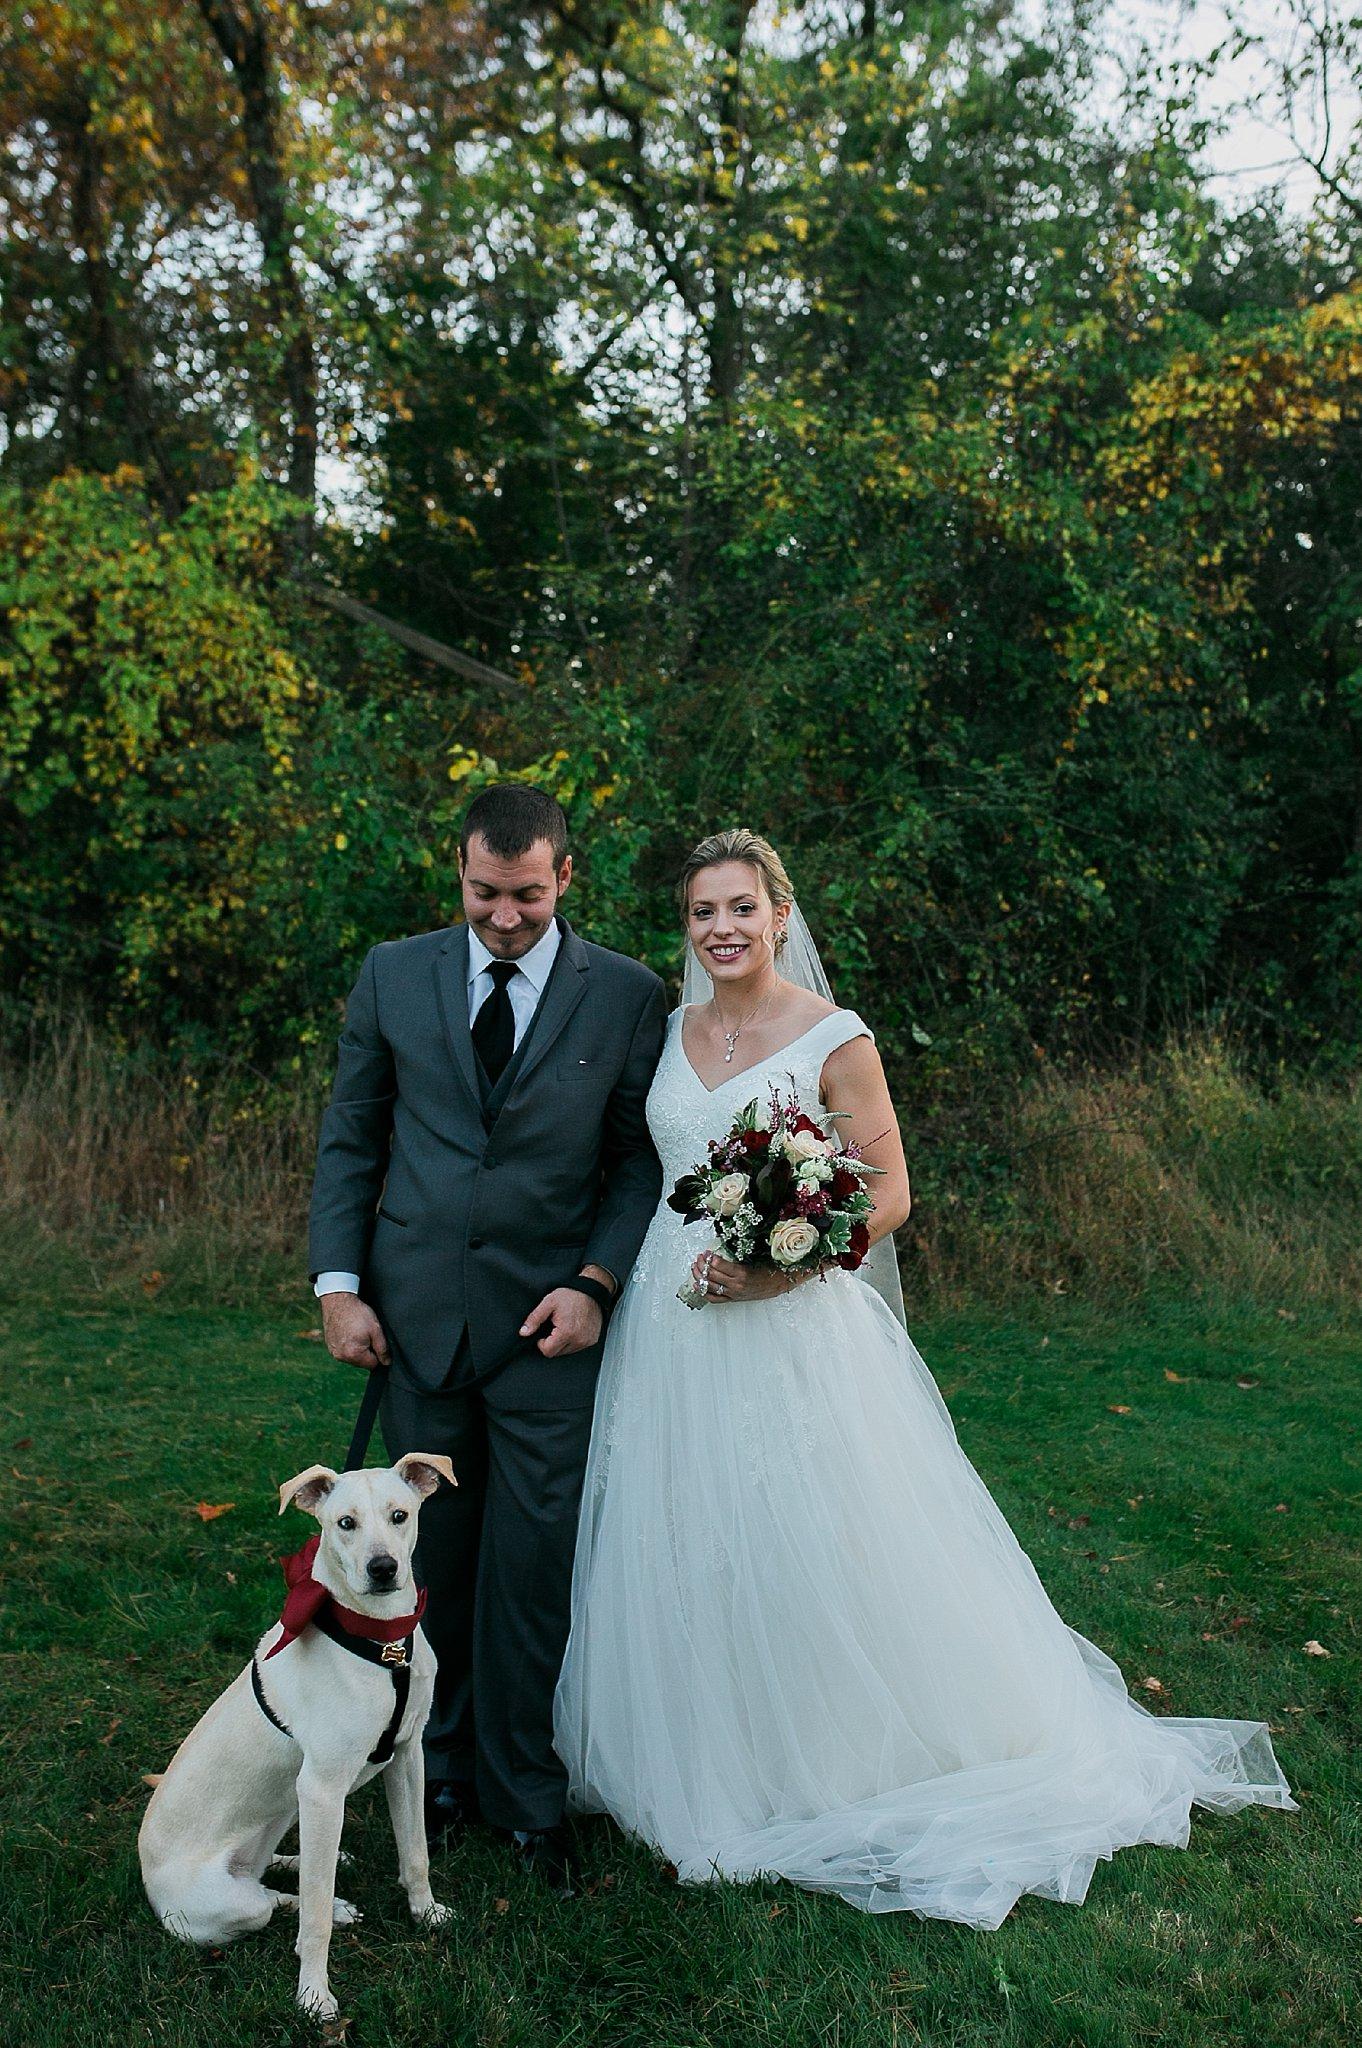 New Windsor New York Hudson Valley New York Wedding Photographer 53.jpg